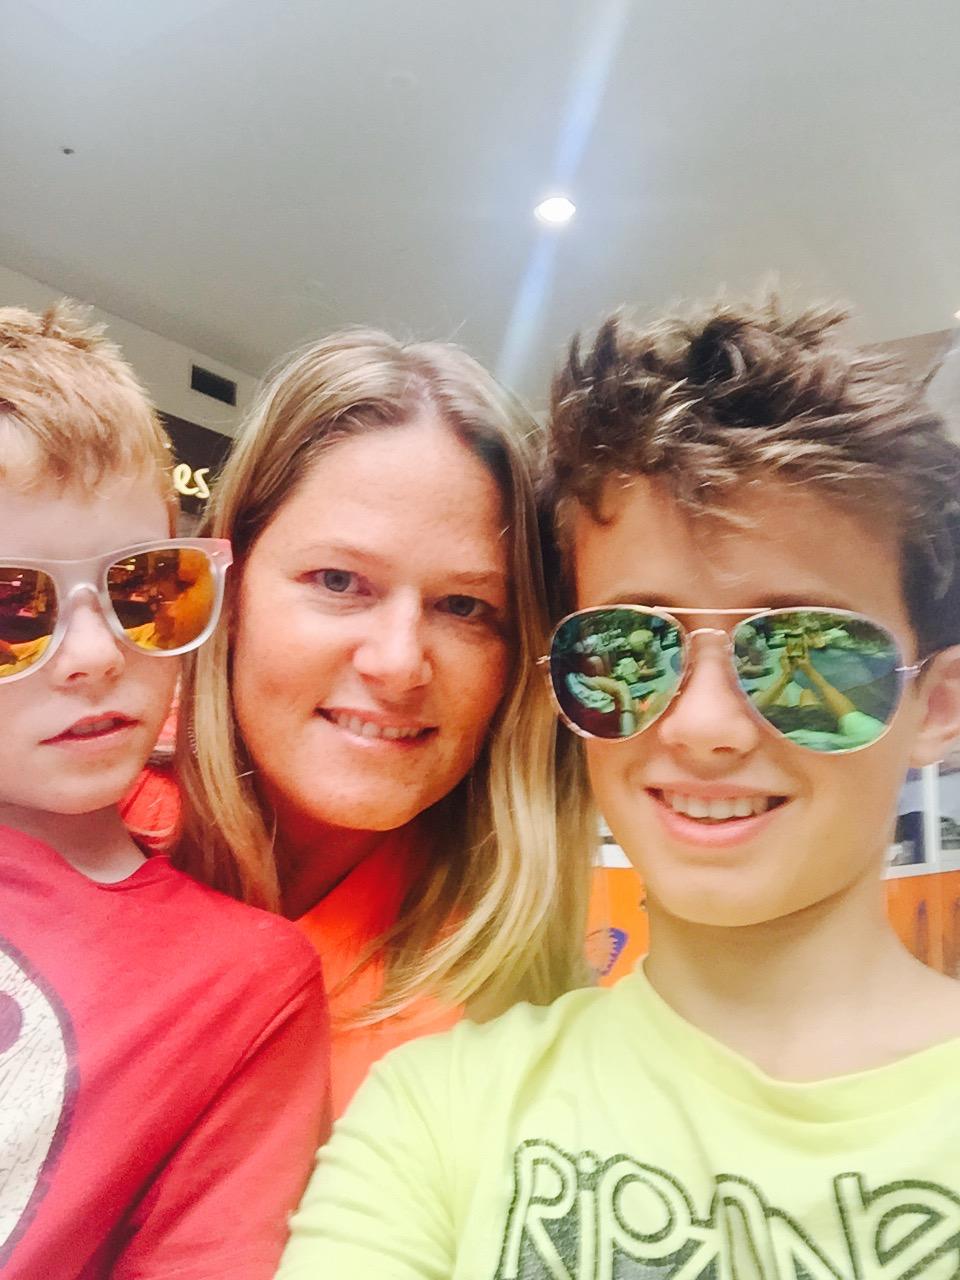 Aunt Jo-Jo bought the boys sunglasses.